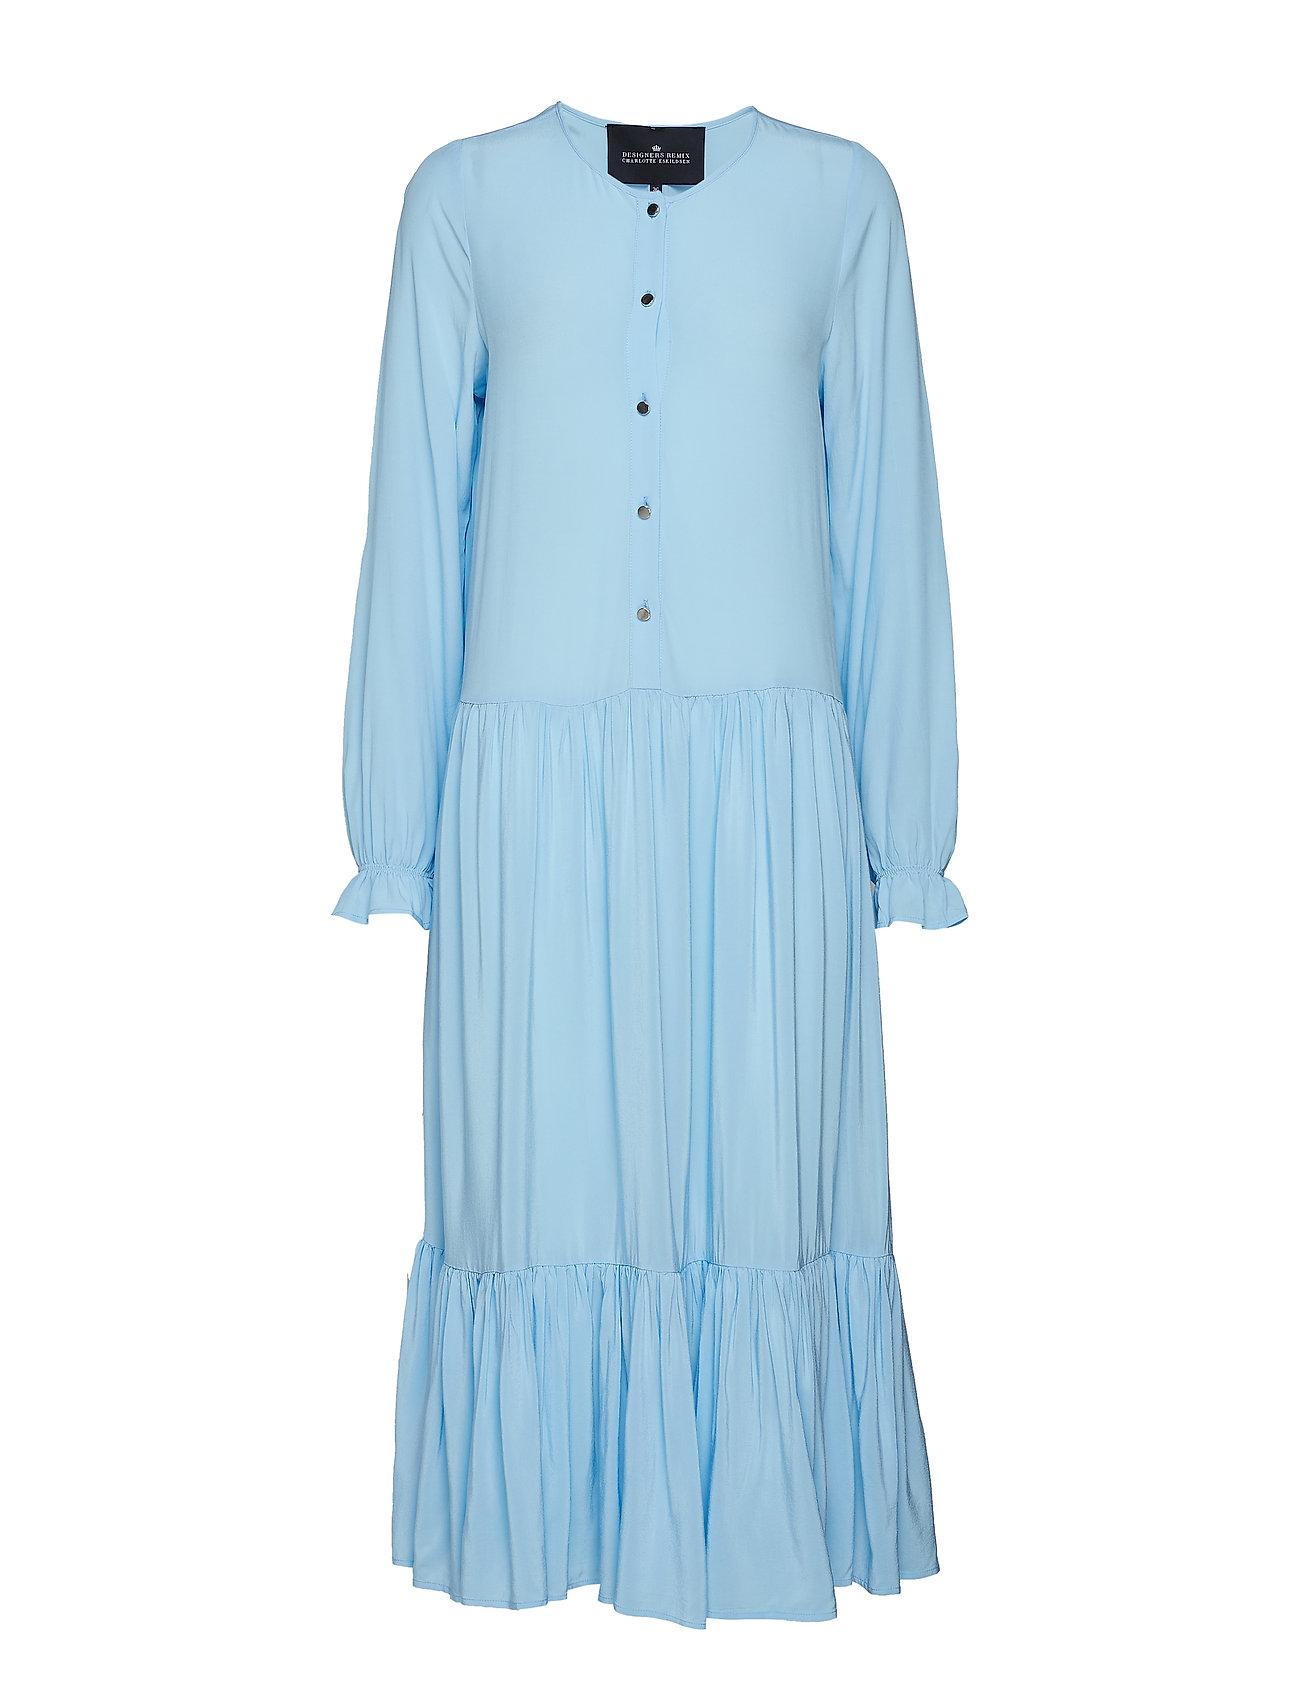 DESIGNERS, REMIX Nini A-line Dress - SKY BLUE